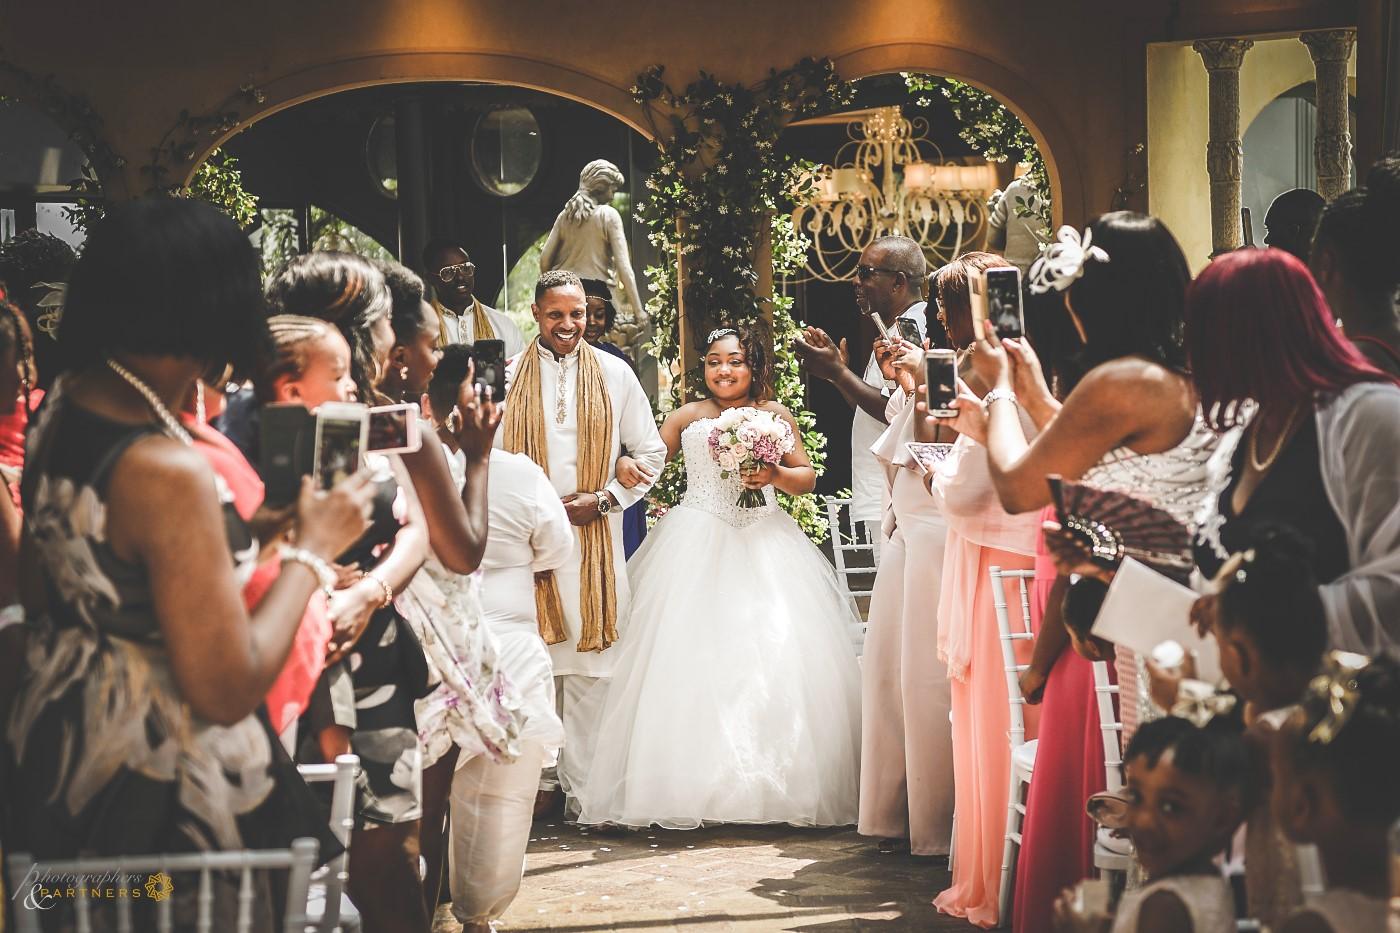 wedding_photograpers_in_tuscany_04.jpg